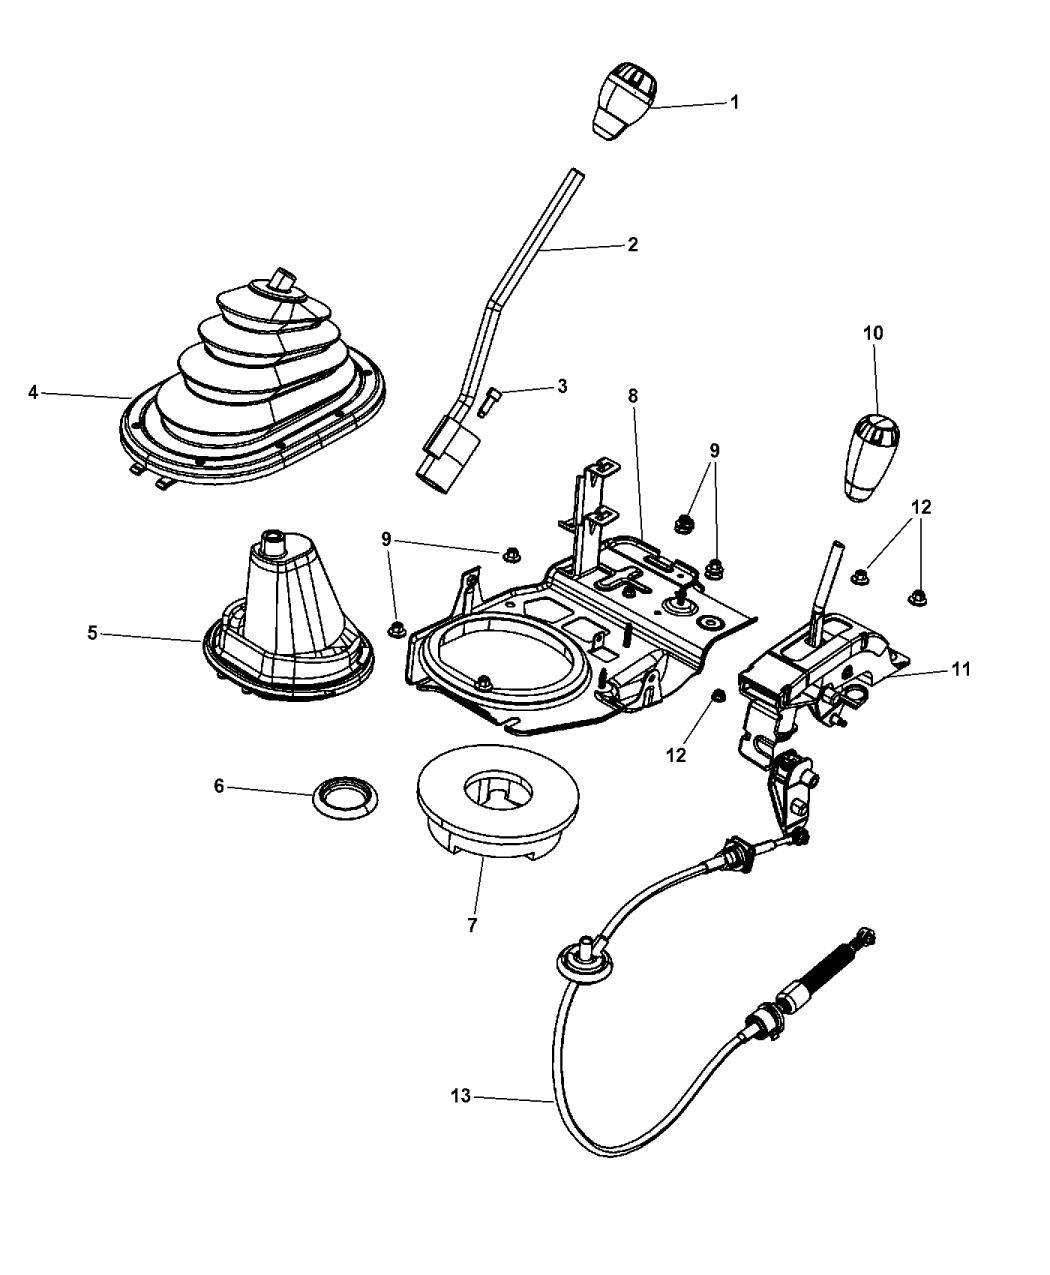 2007 Jeep Wrangler Gear Shift Controls - Thumbnail 4